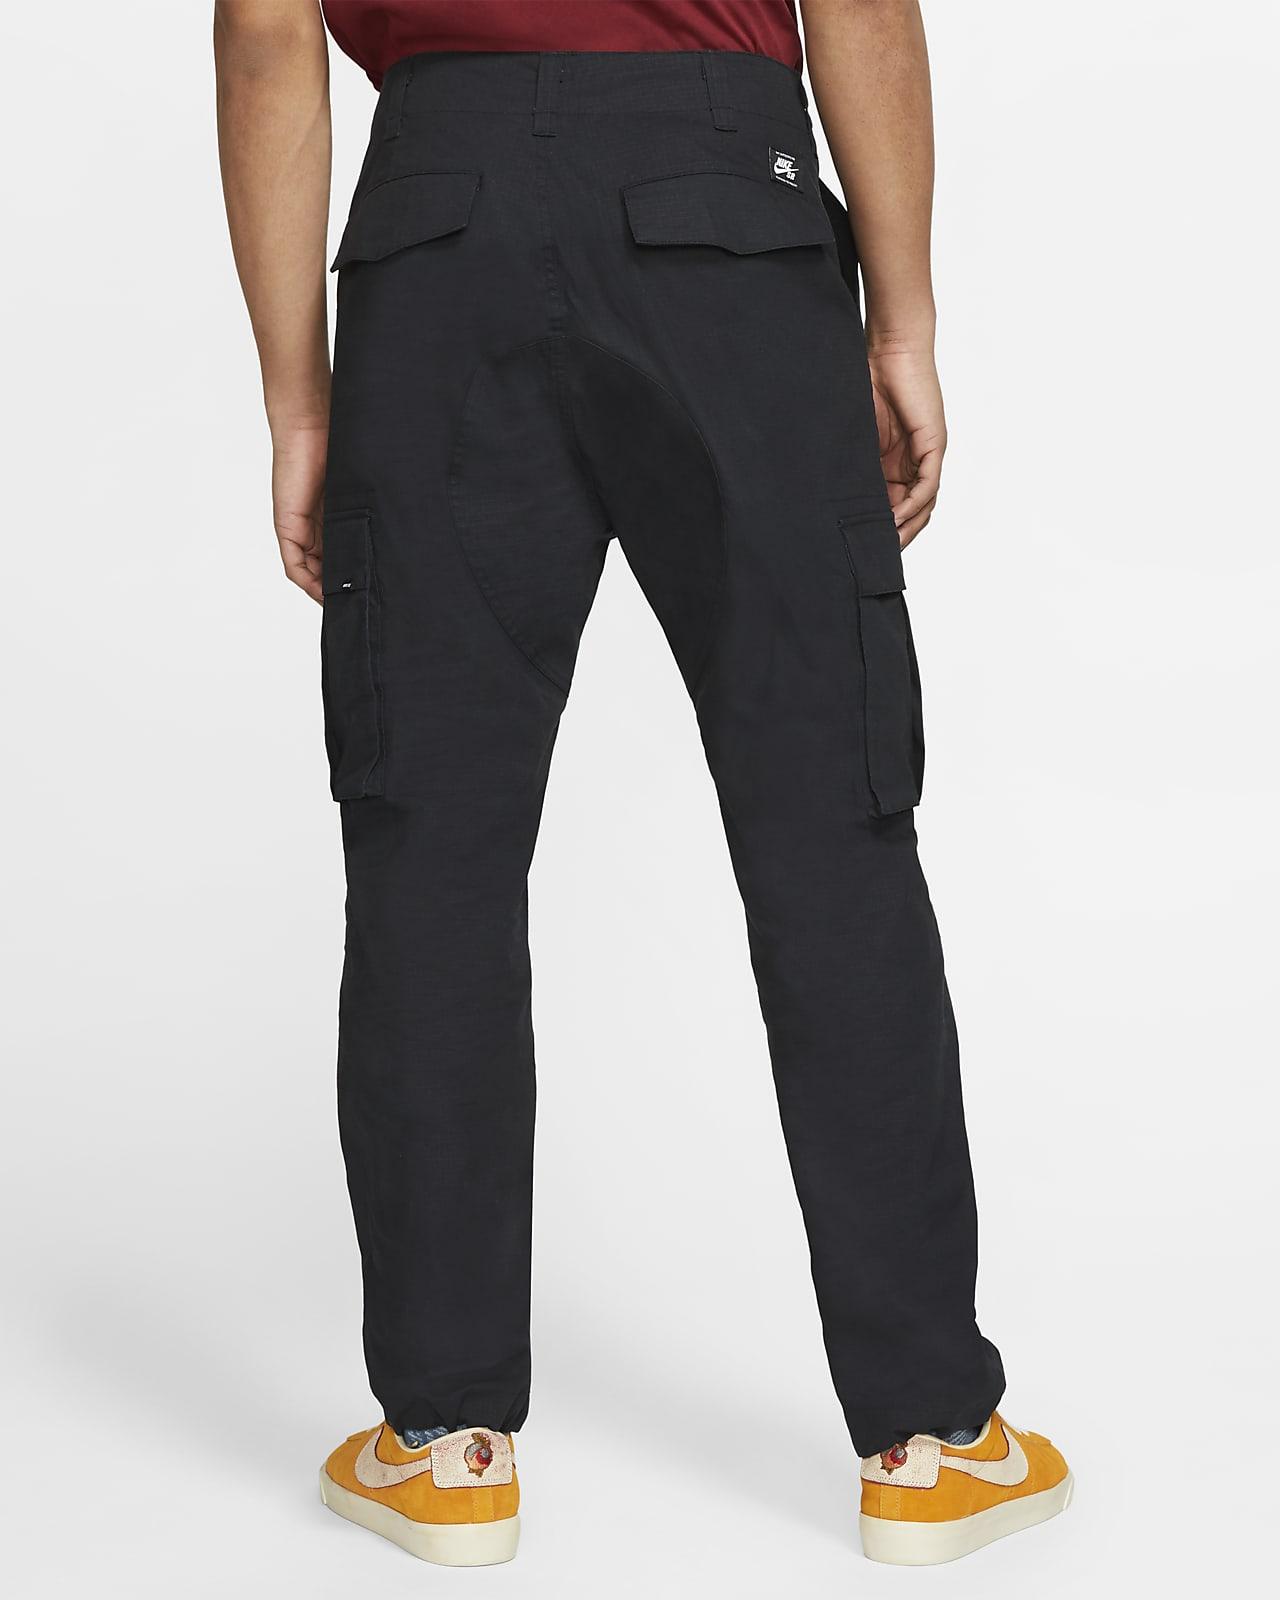 Feudo instante Psicologicamente  Nike SB Flex FTM Skate Cargo Trousers. Nike GB